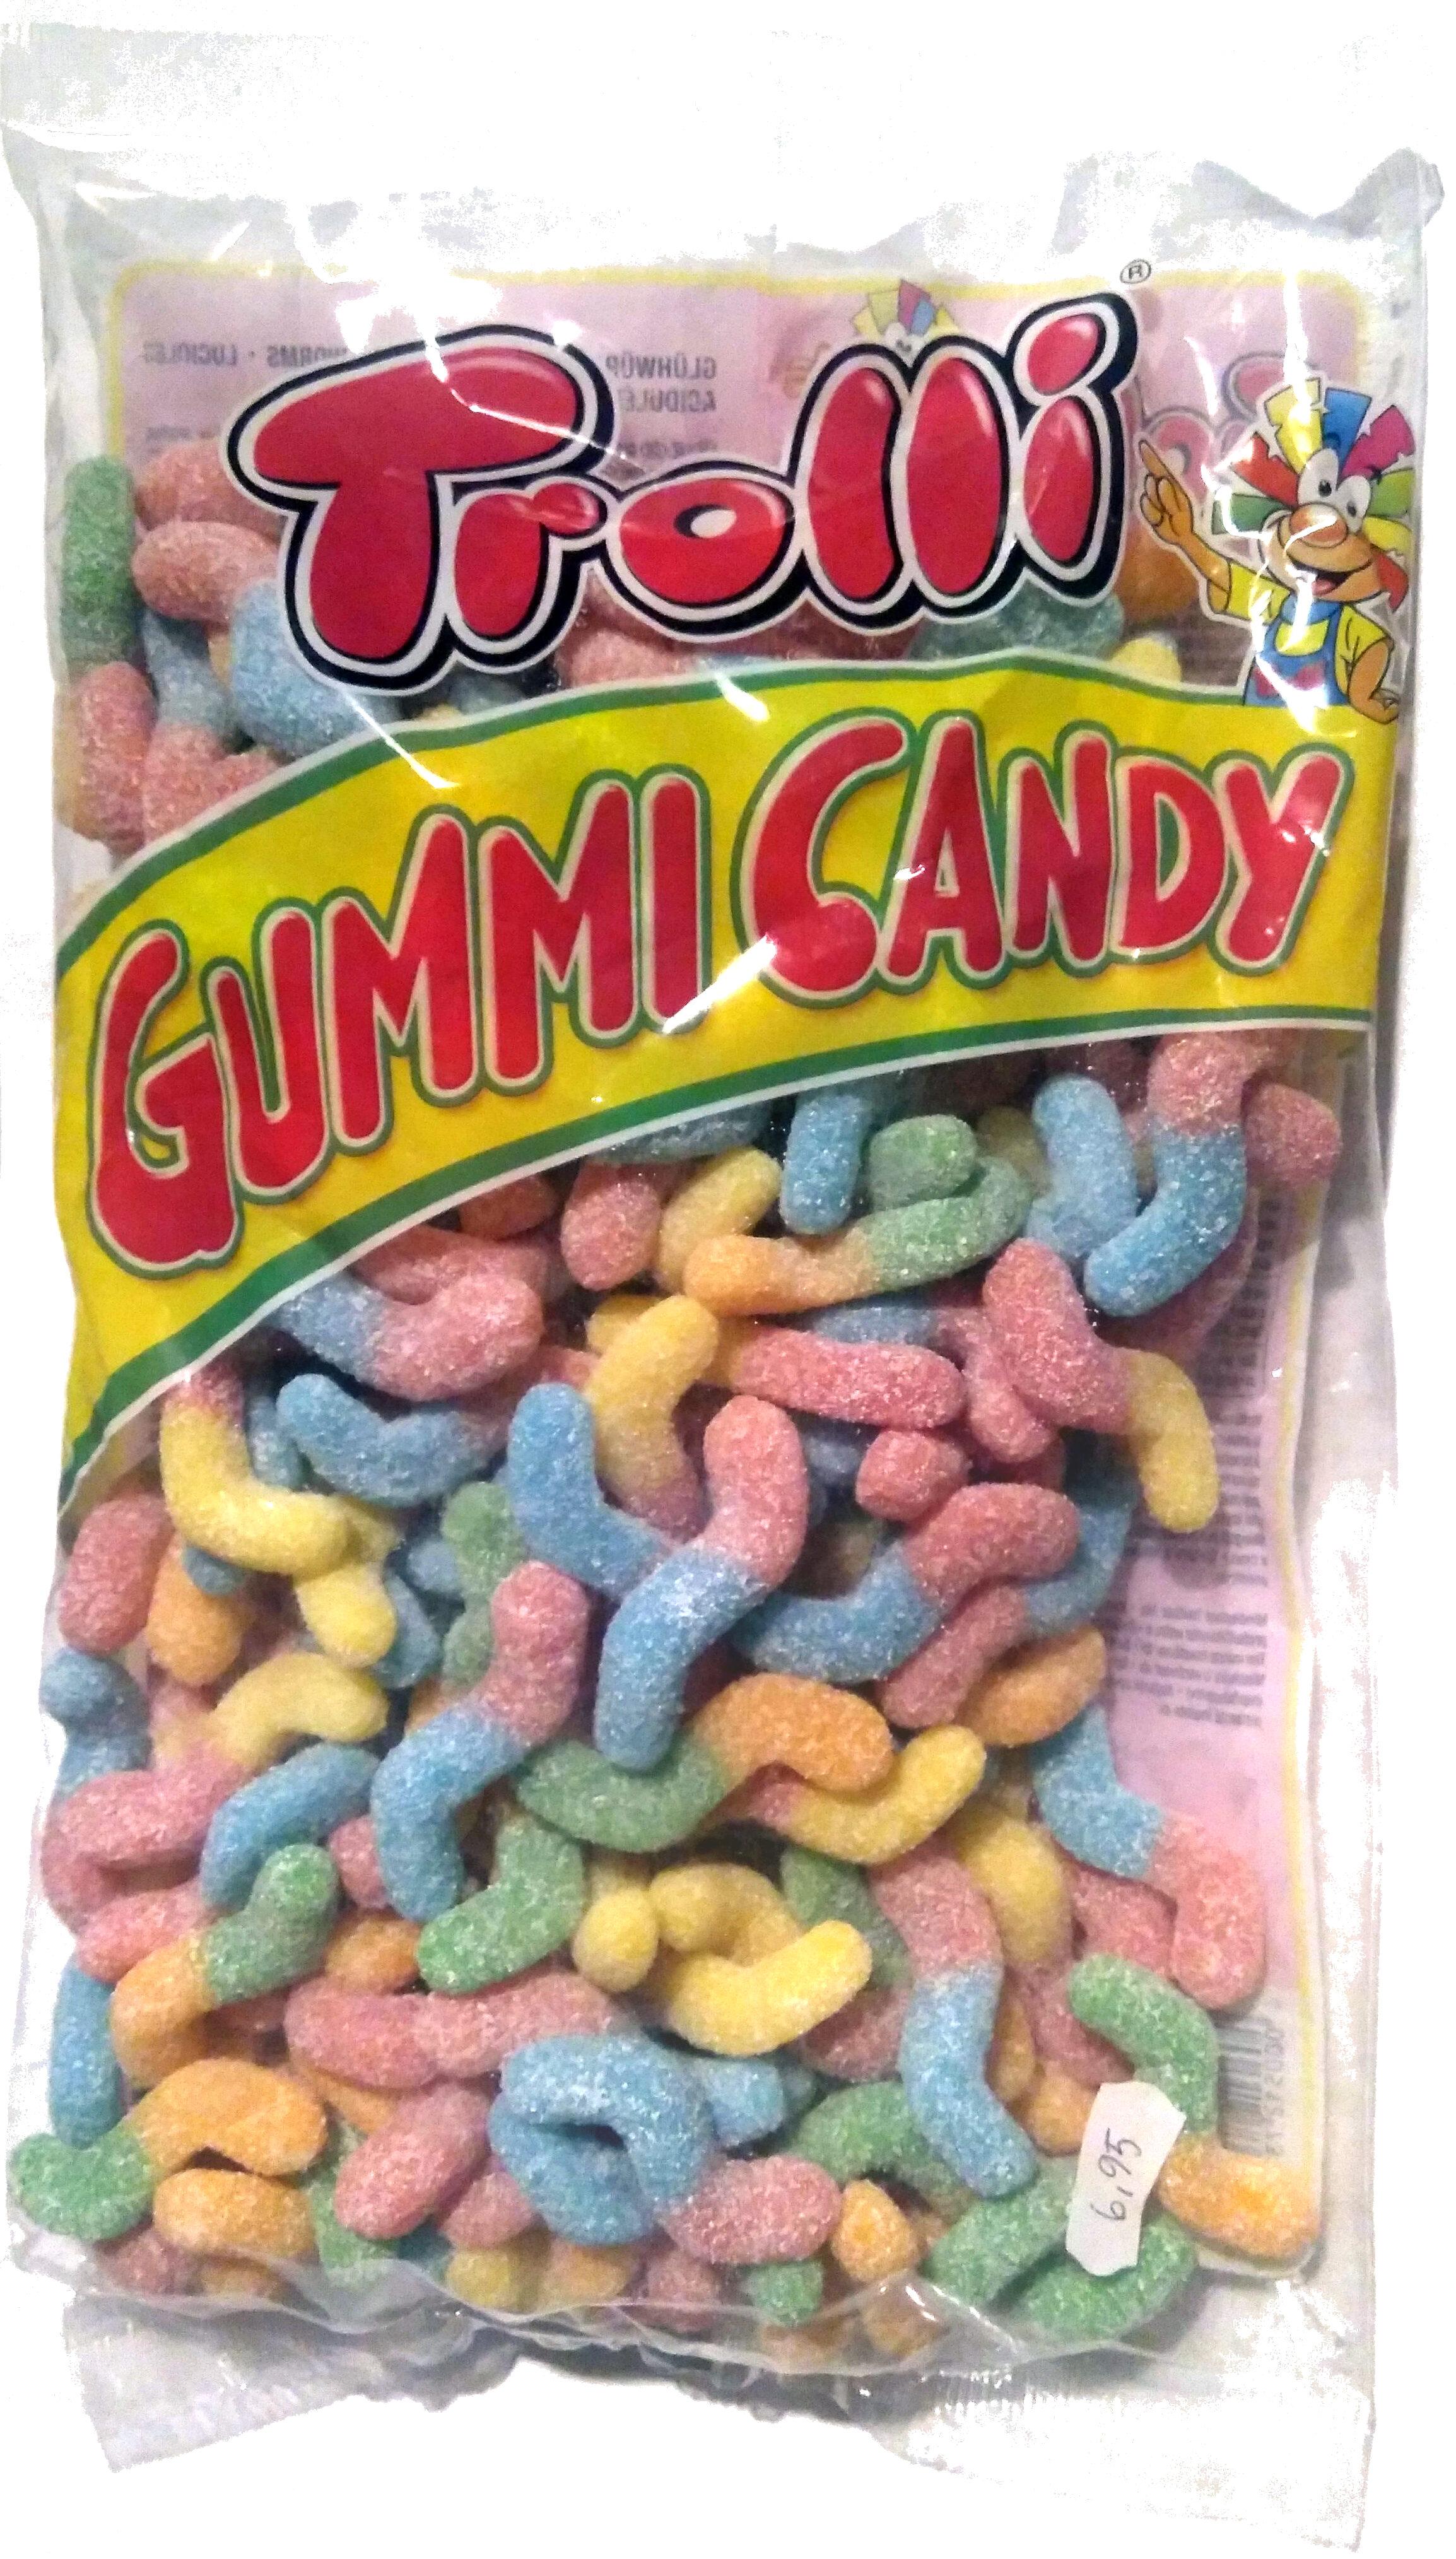 Gummi Candy - Product - nl